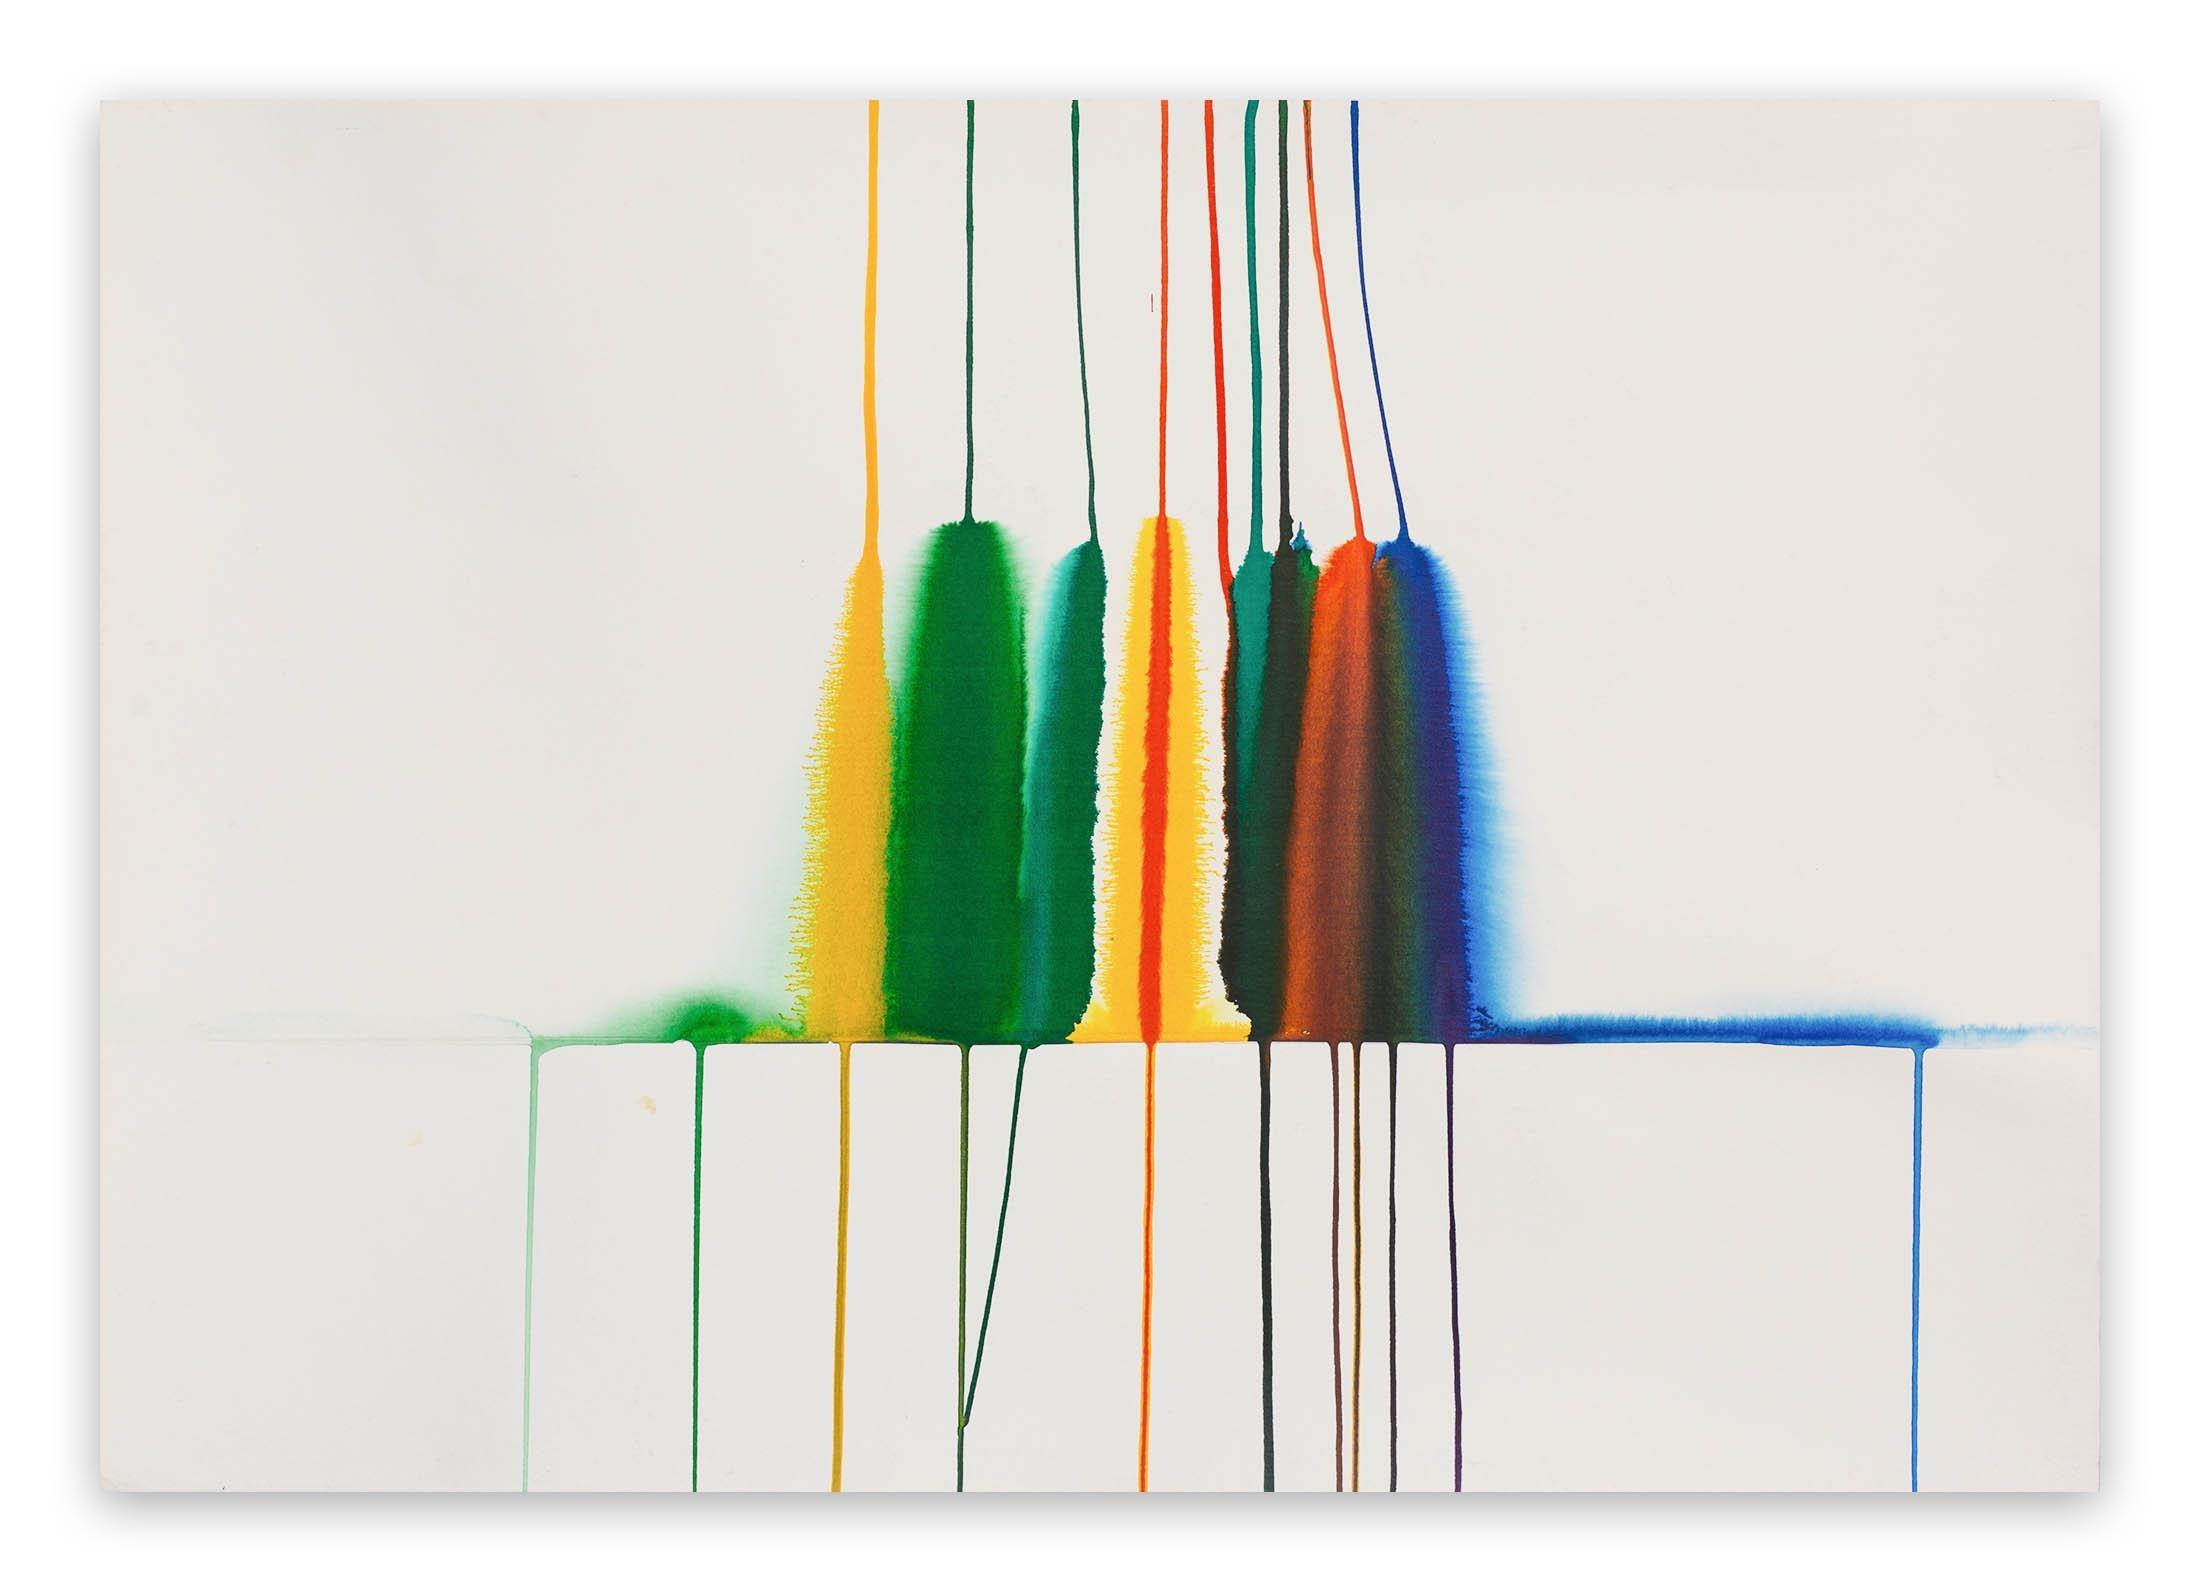 Untitled (Ref 17136)